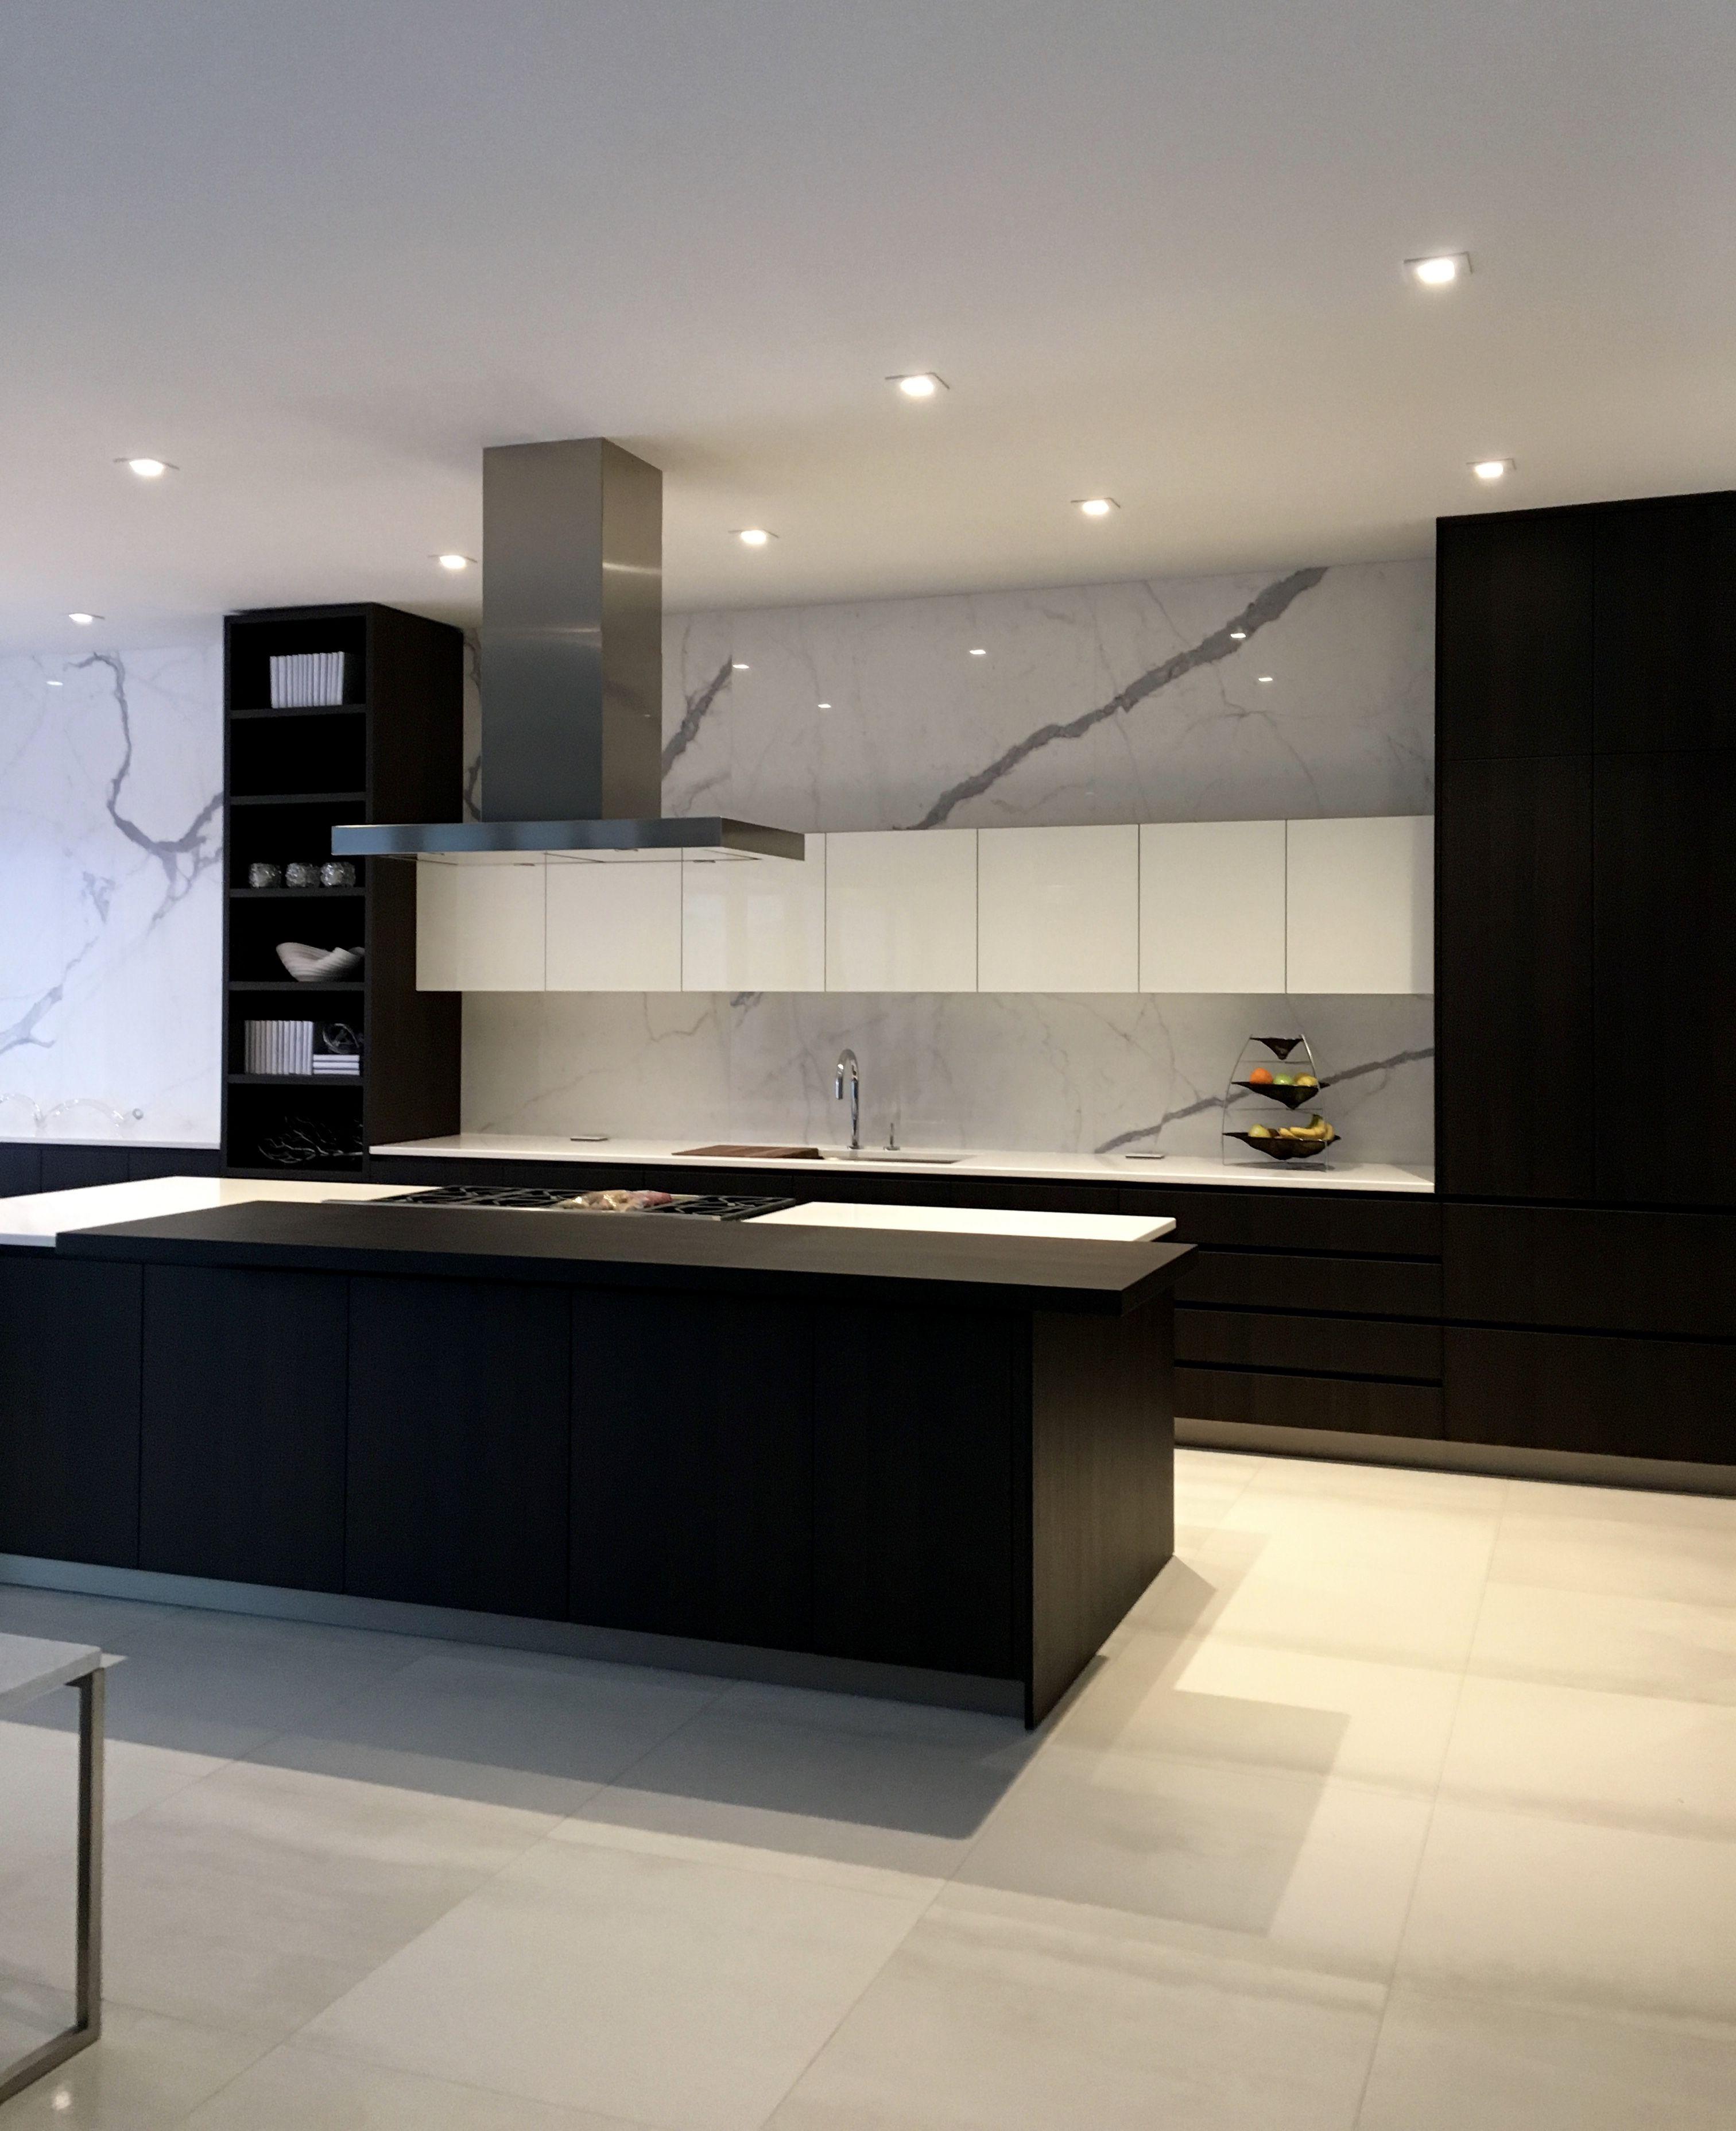 17 11 20 Omar Poliform 21 931 Rid Wall Systems Kitchen Cabinet Styles Aluminum Kitchen Cabinets